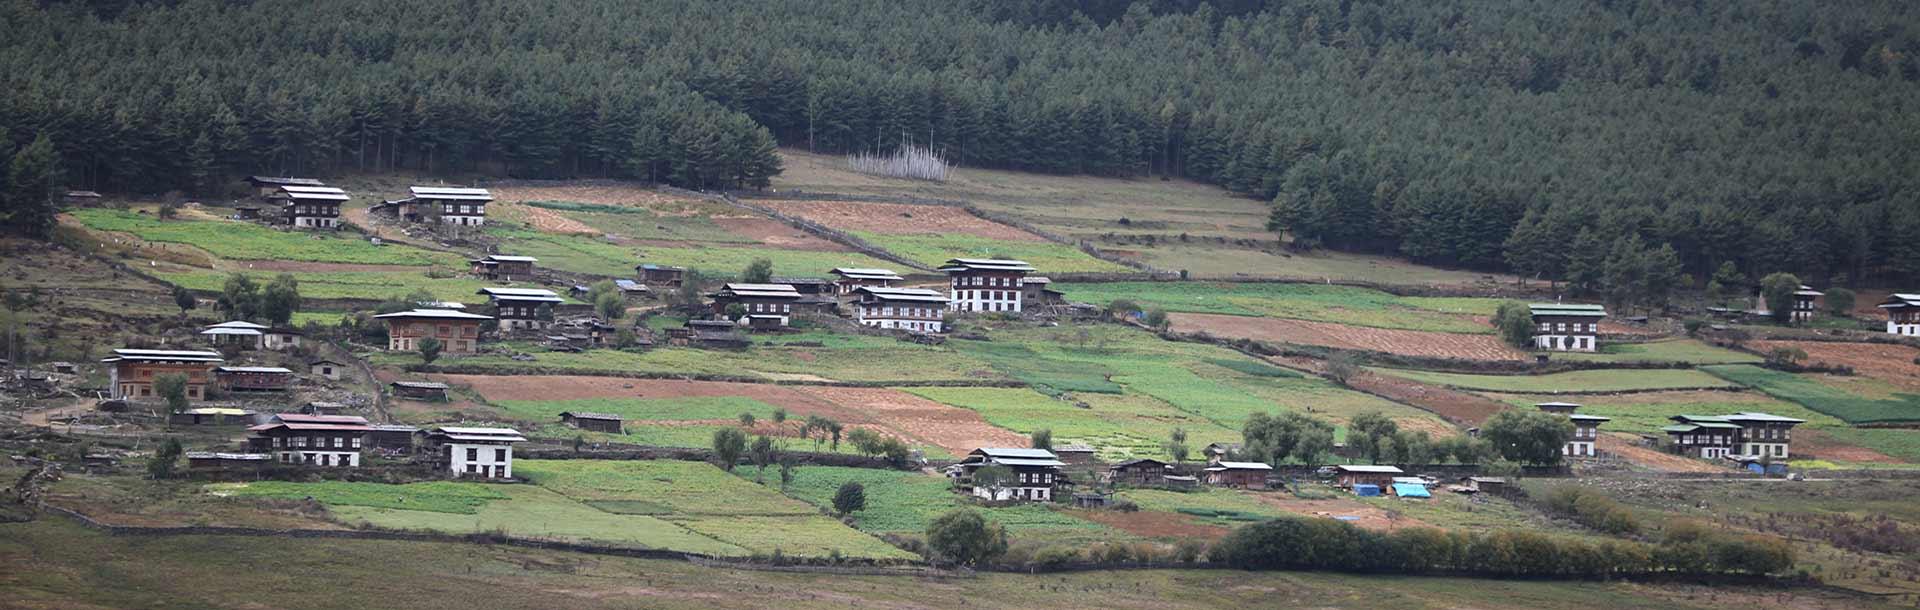 A village in Phobjikha valley